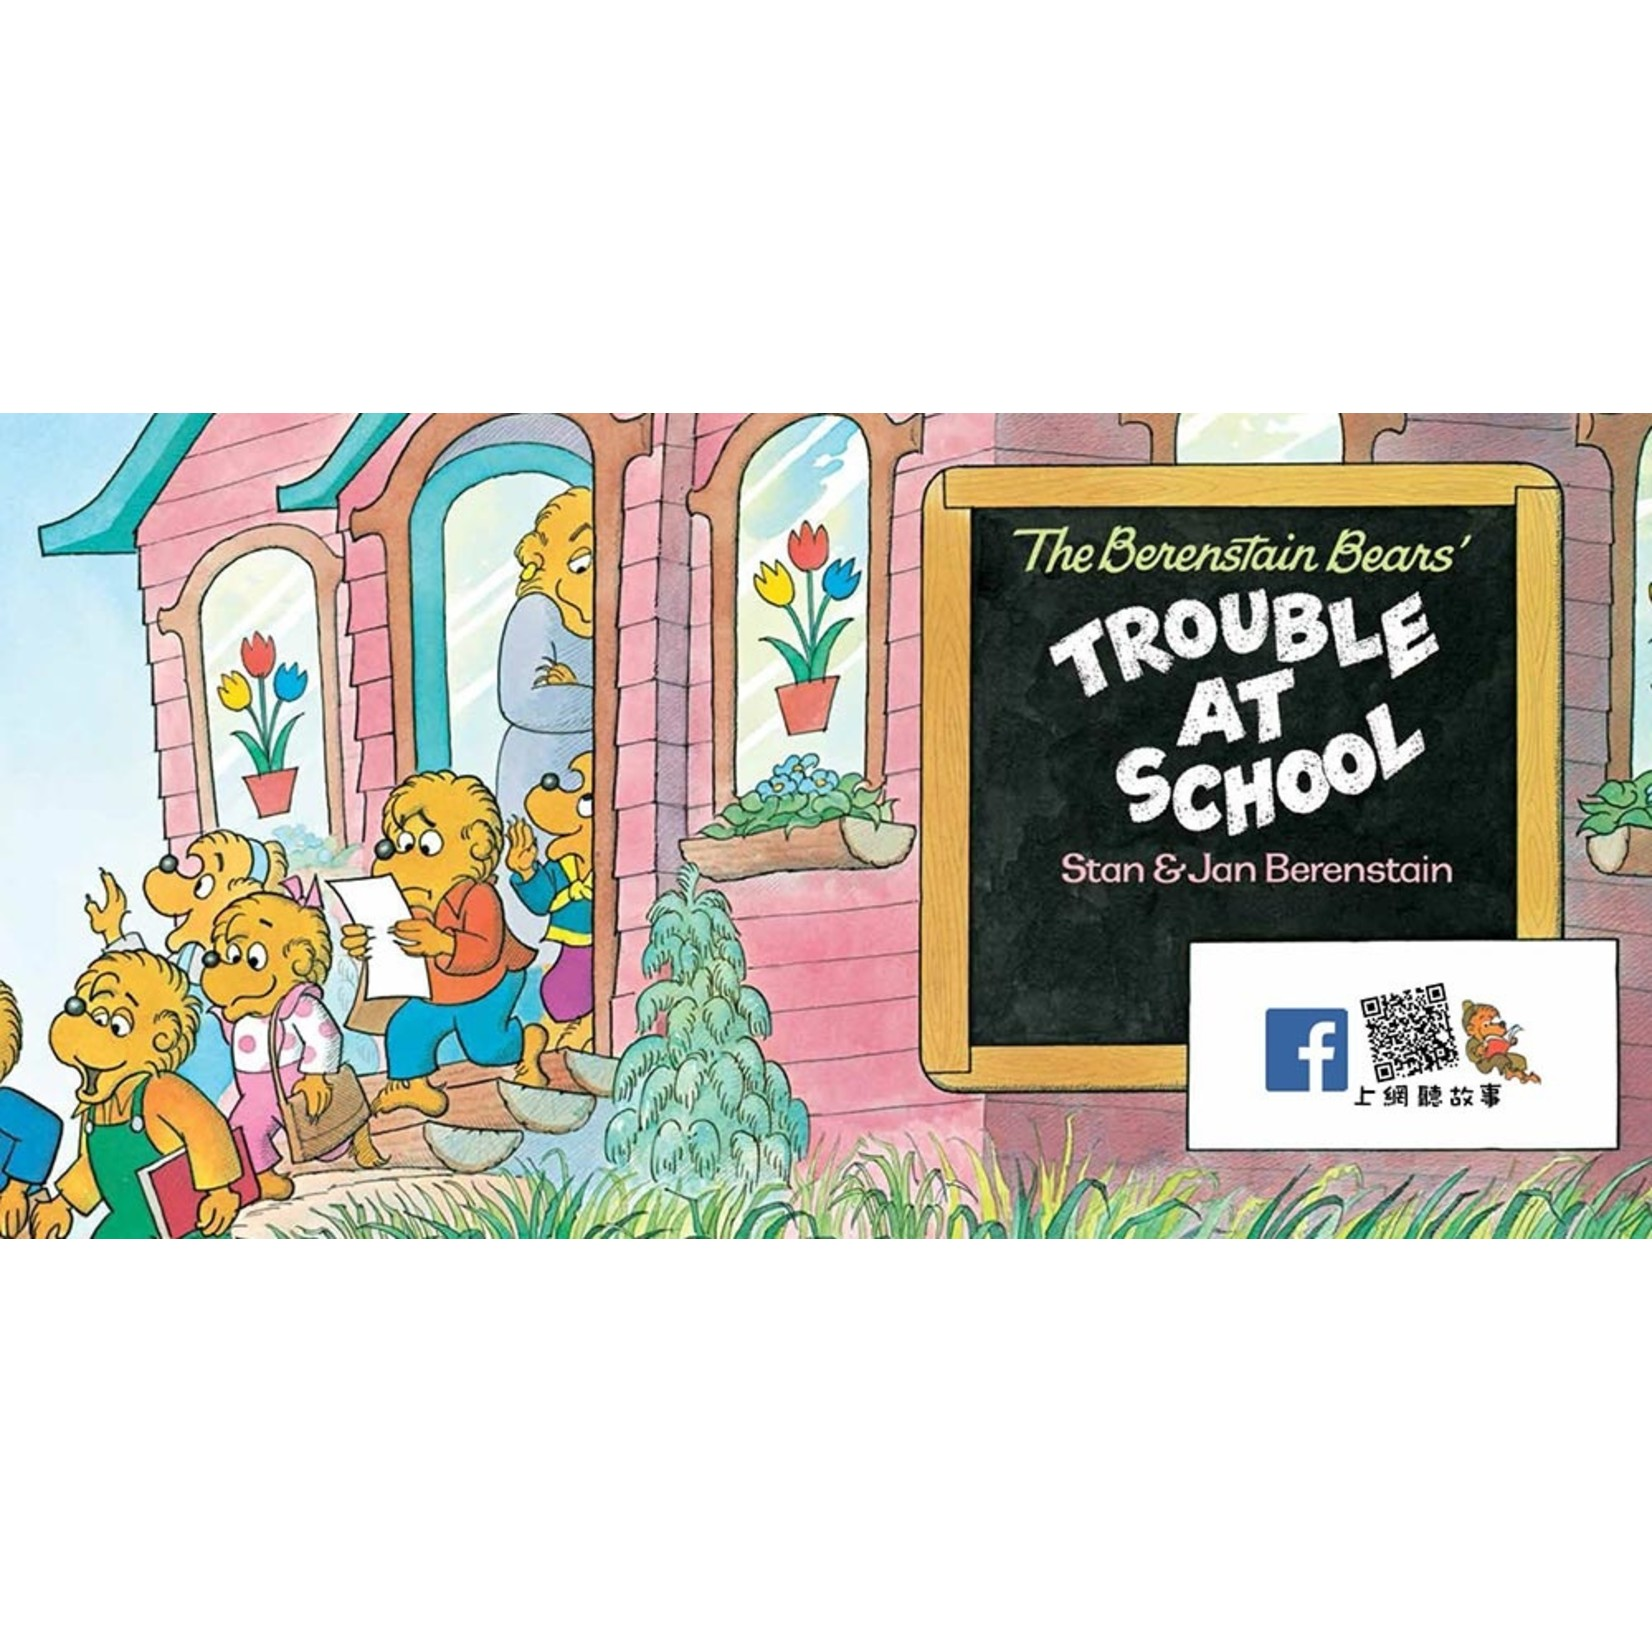 生命樹 Life Tree Global 貝安斯坦熊系列06:學校裡的煩惱 The Berenstain Bears 06: Trouble At School